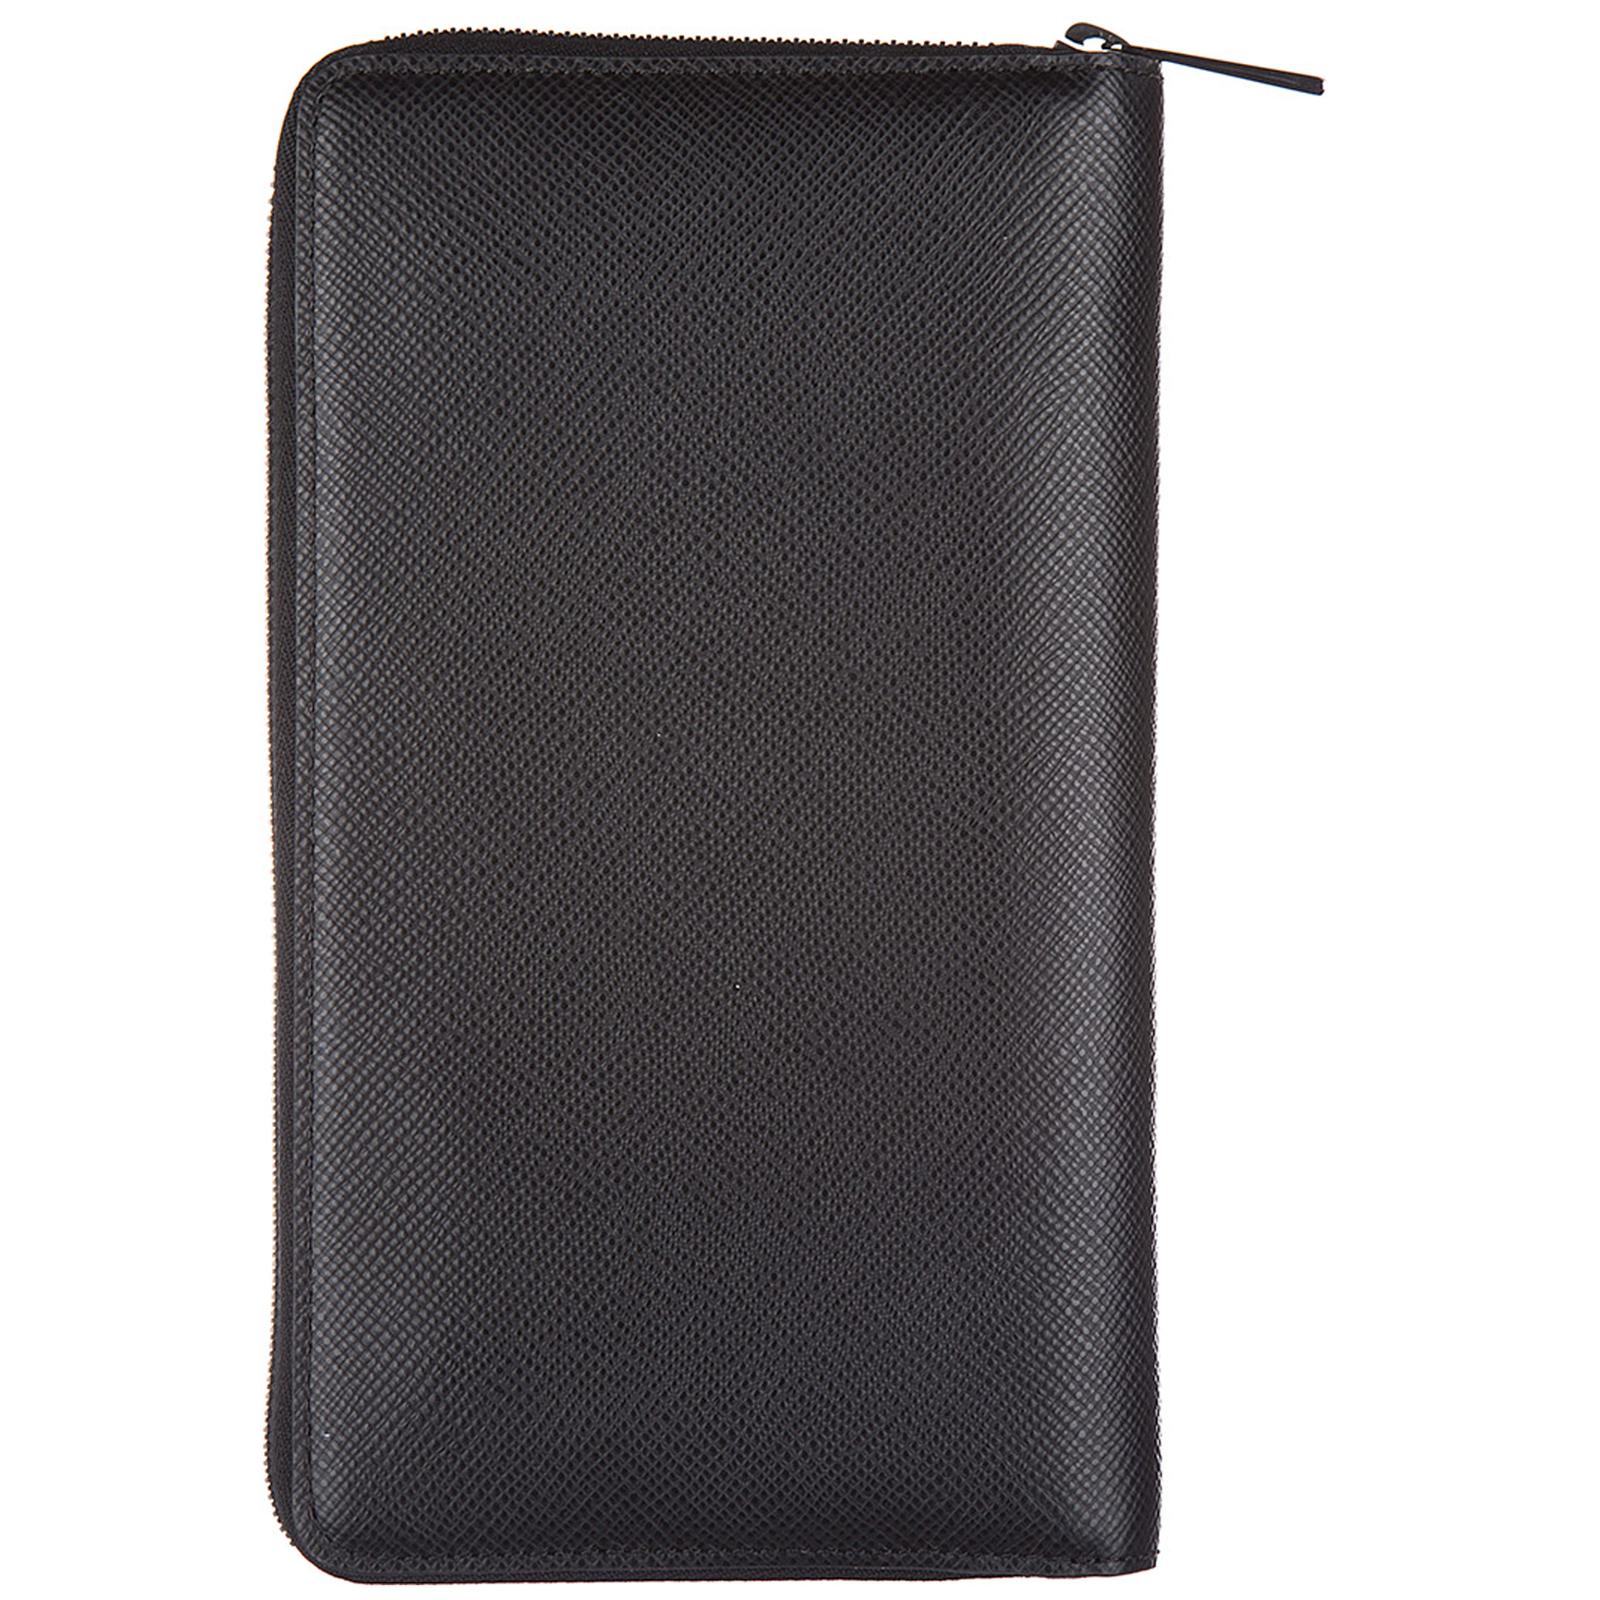 ecc3584b7306 Michael Kors Men s wallet genuine leather coin case holder purse card  bifold harrison travel